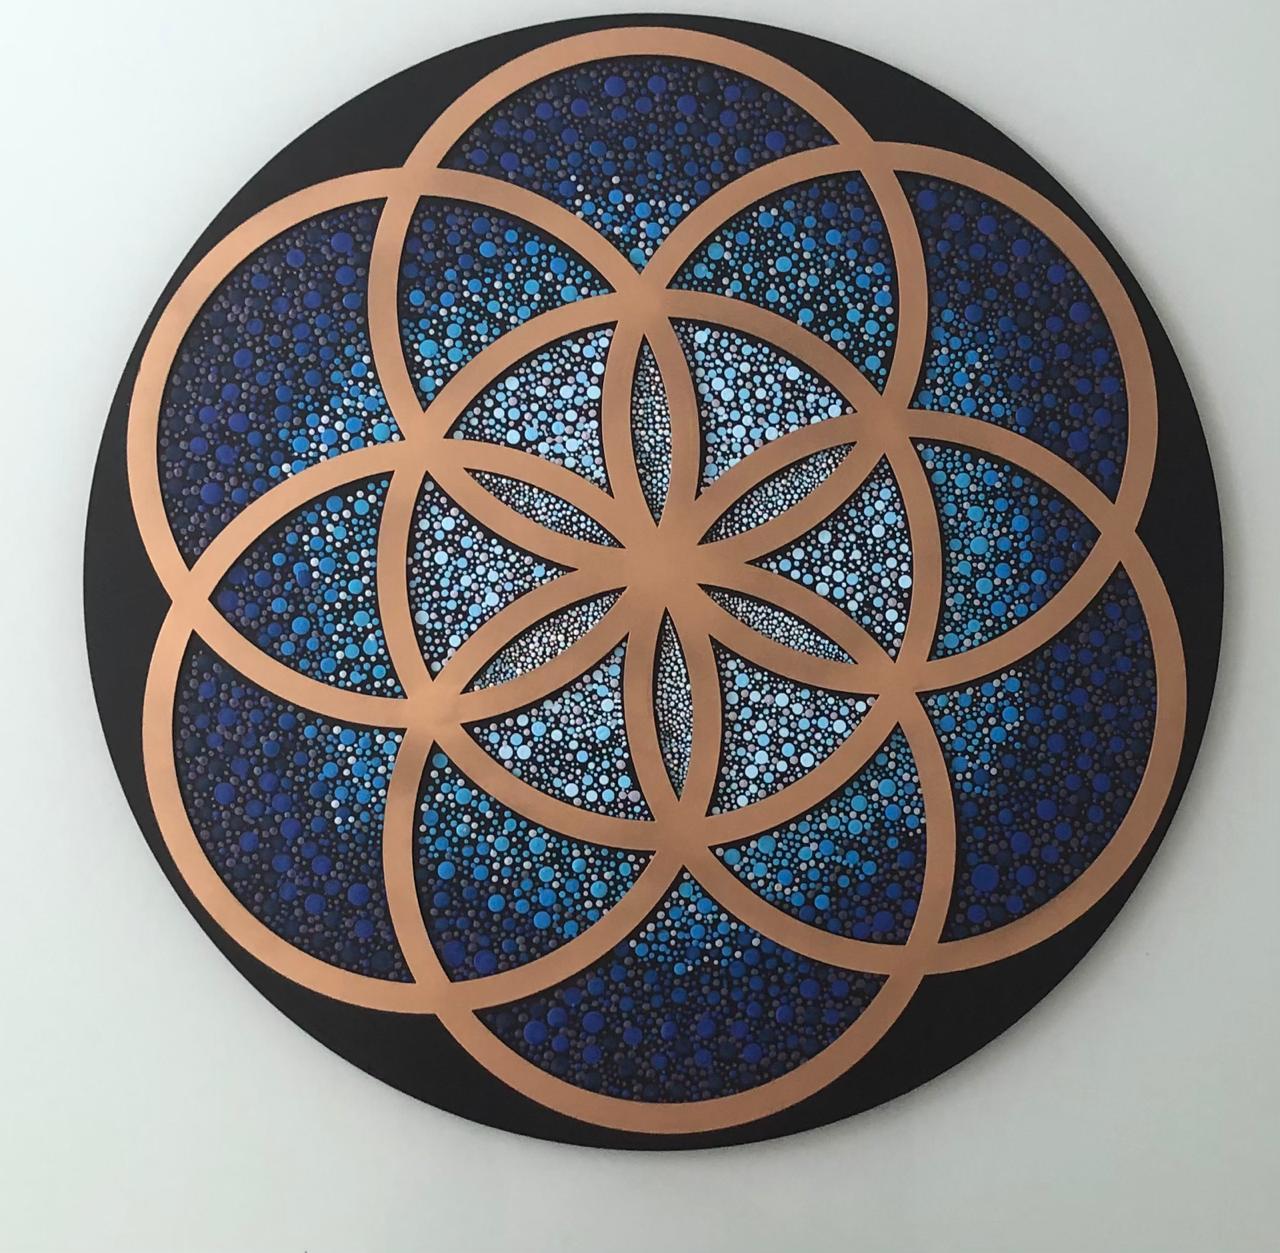 semilla-de-vida-azul-joyas-artesanales-mexico-BOA135-BOA136-BOA137-geometria